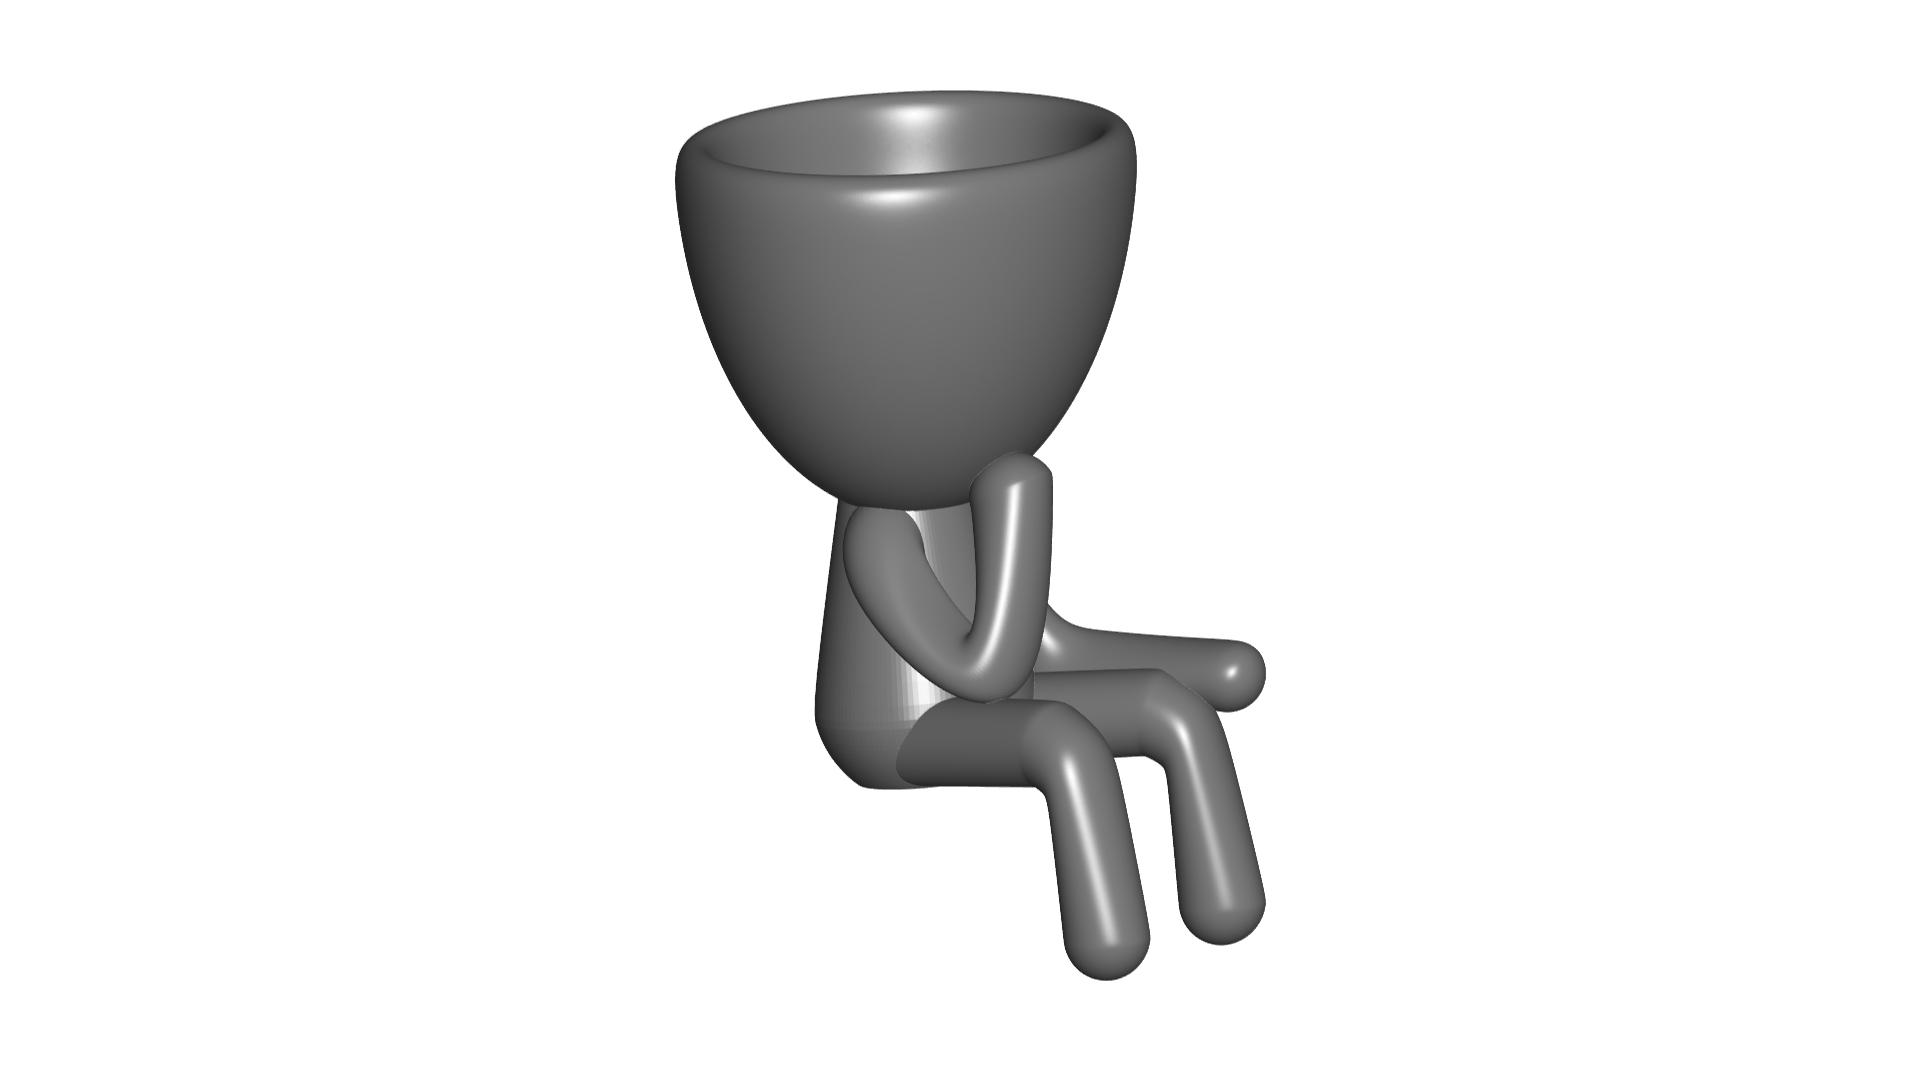 Vaso_11_Gris_1.jpg Télécharger fichier STL gratuit JARRÓN MACETA ROBERT 11 - VASE POT DE FLEURS ROBERT 11 • Design à imprimer en 3D, CREATIONSISHI